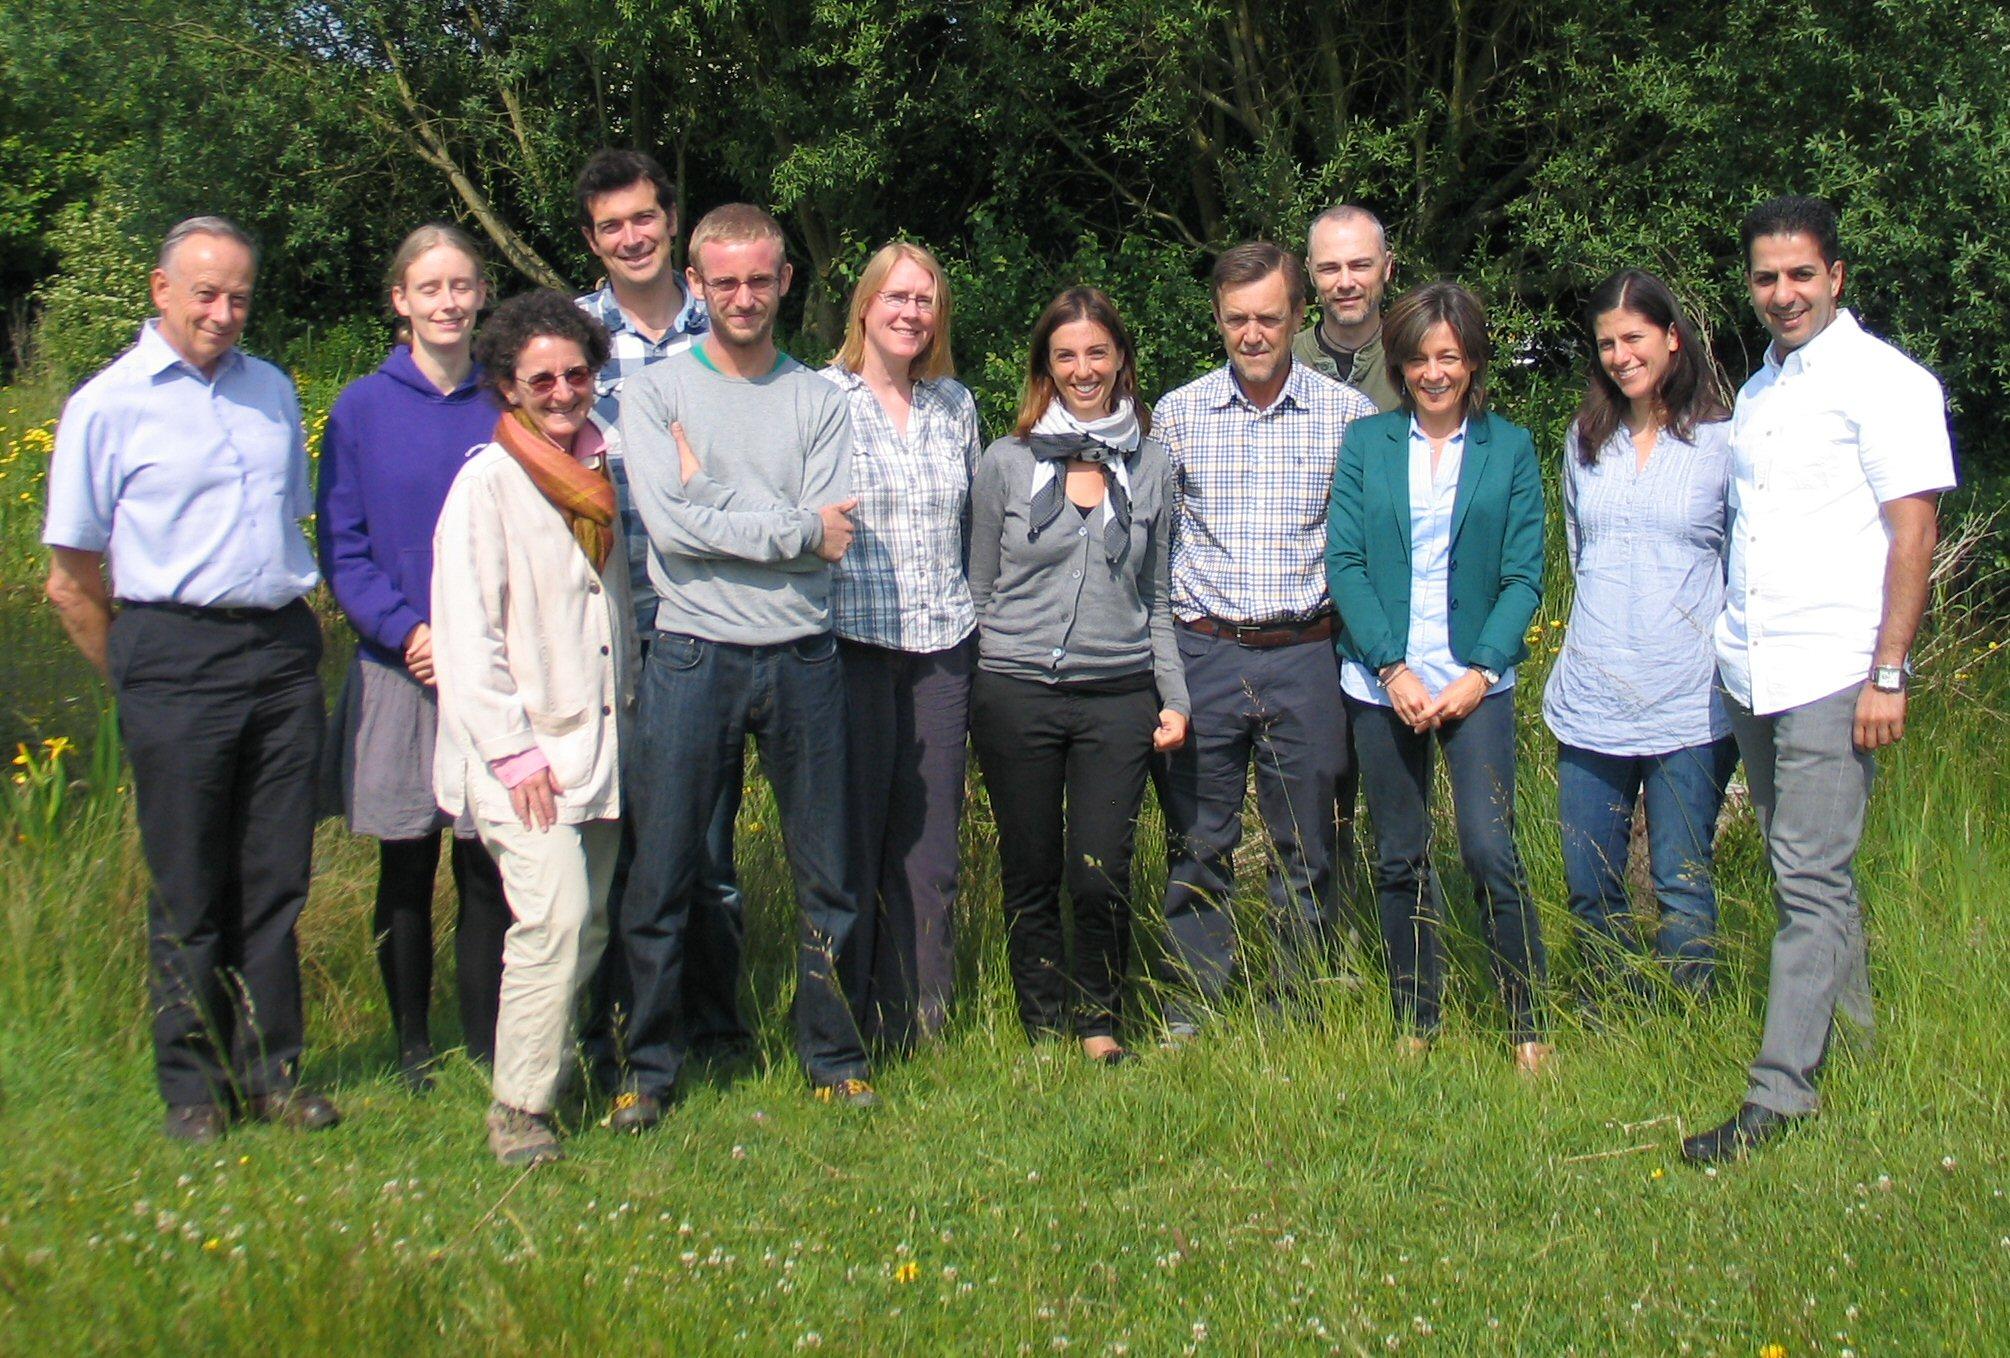 Participants of IUCN Red List Trainers' Workshop, Cambridge, UK (June 2013)